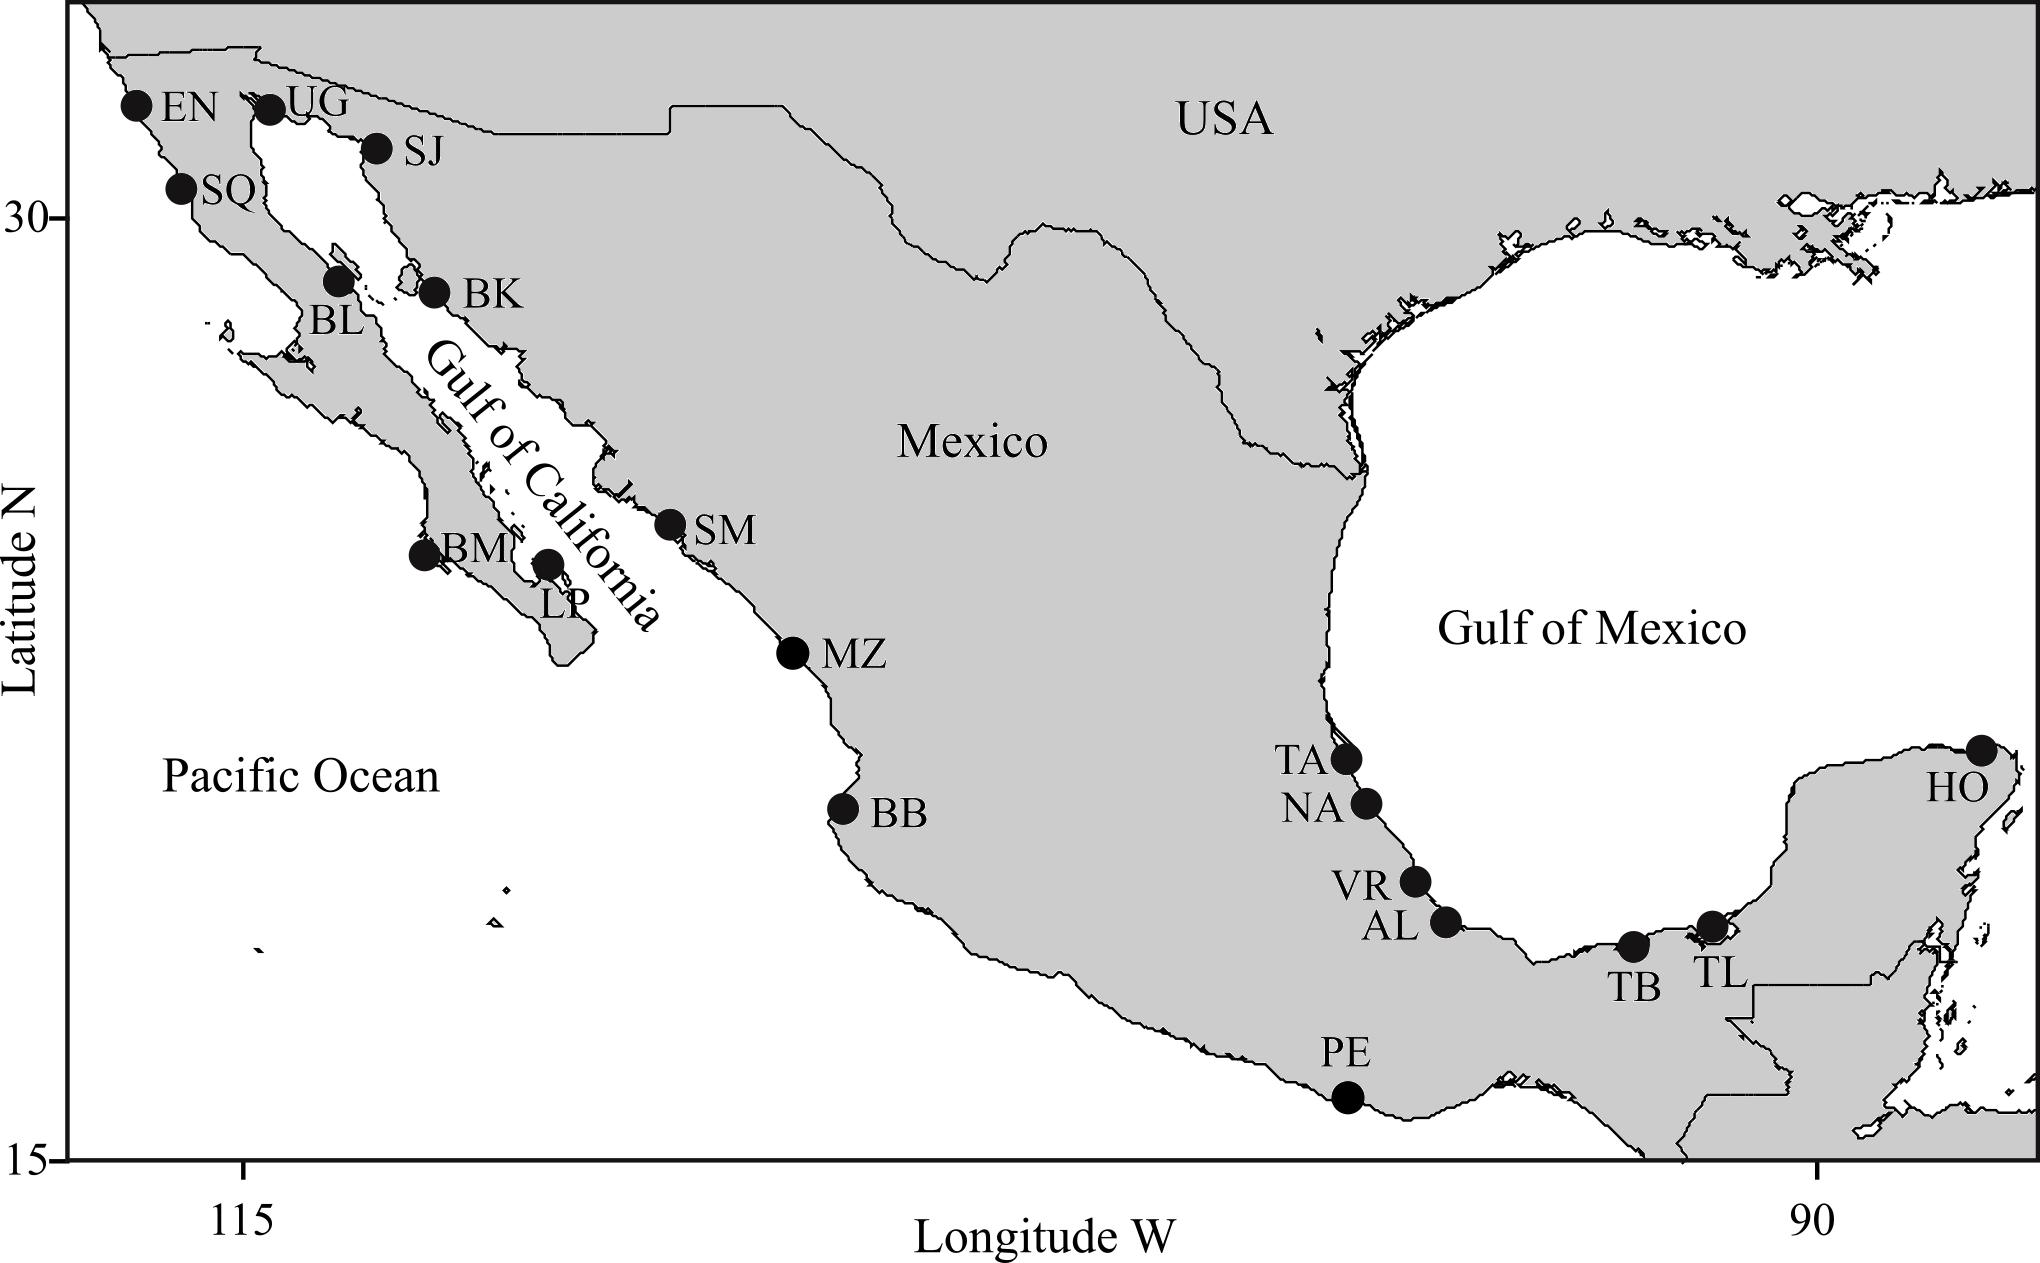 Phenotypic Variation In Dorsal Fin Morphology Of Coastal